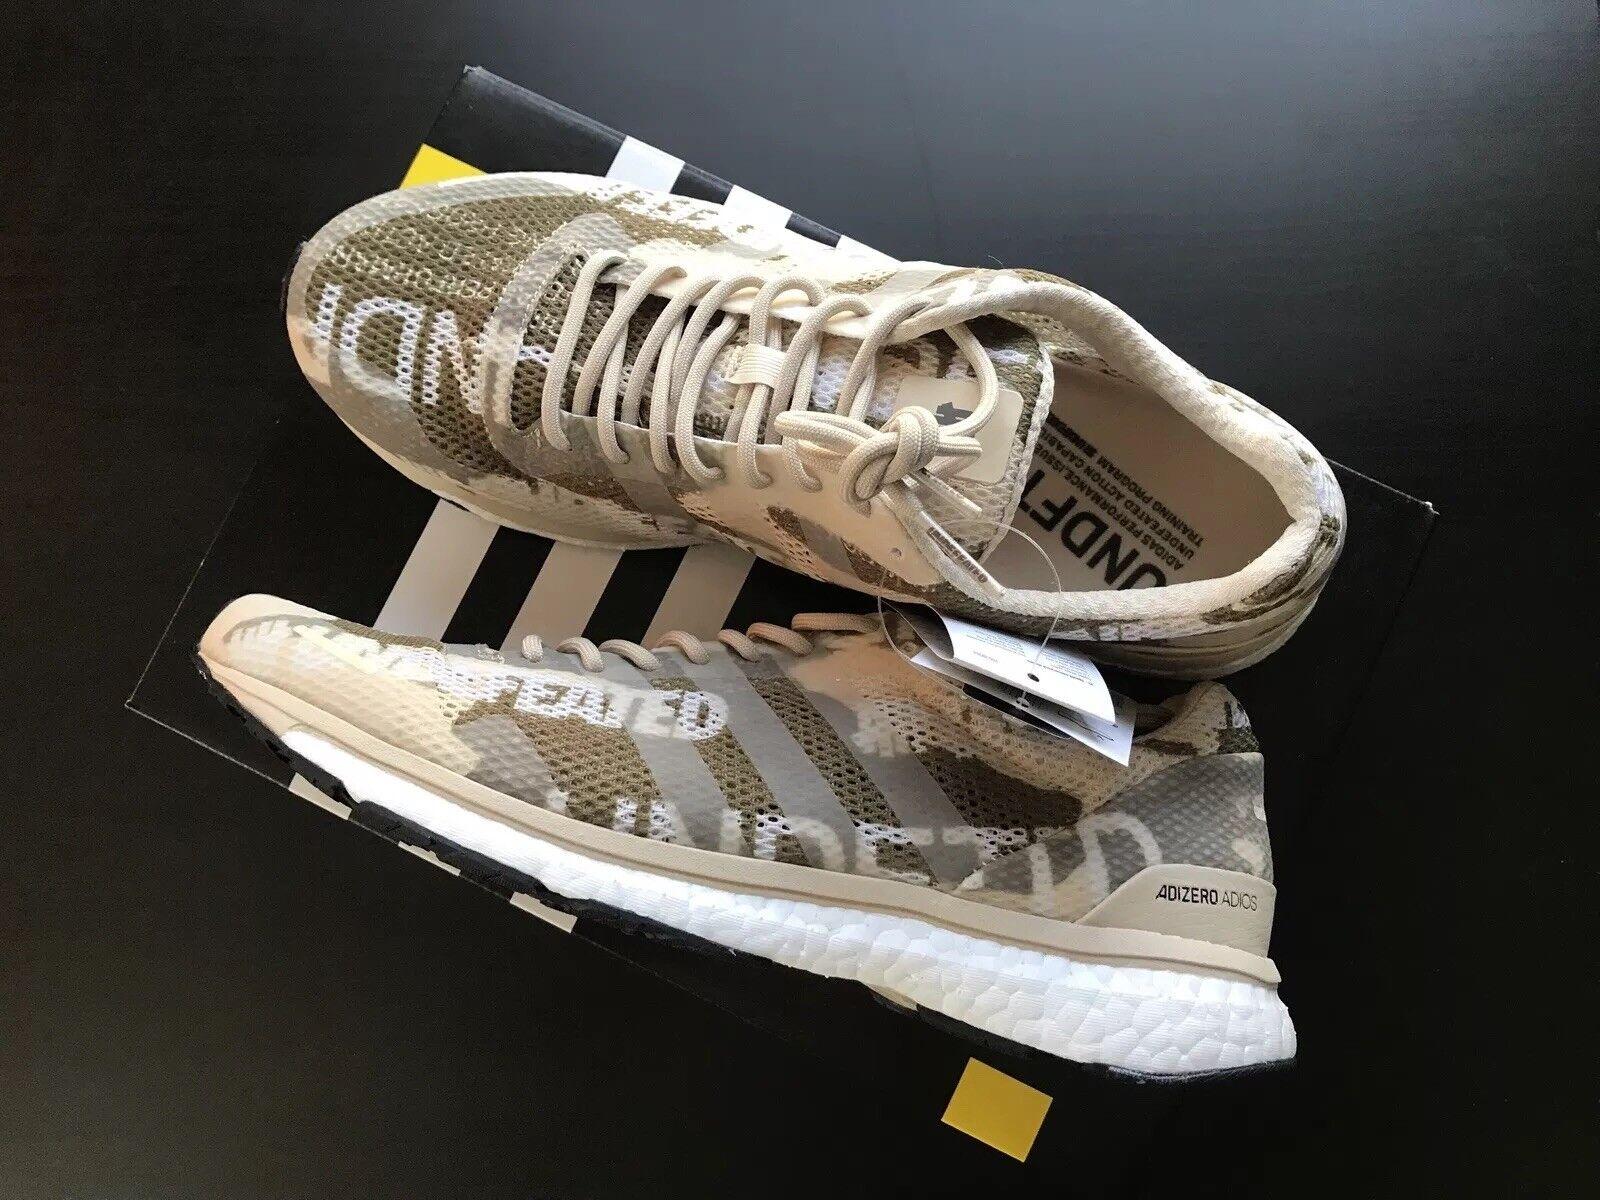 Undefeated x Adidas Adizero Adios Desert Camo size 10.5